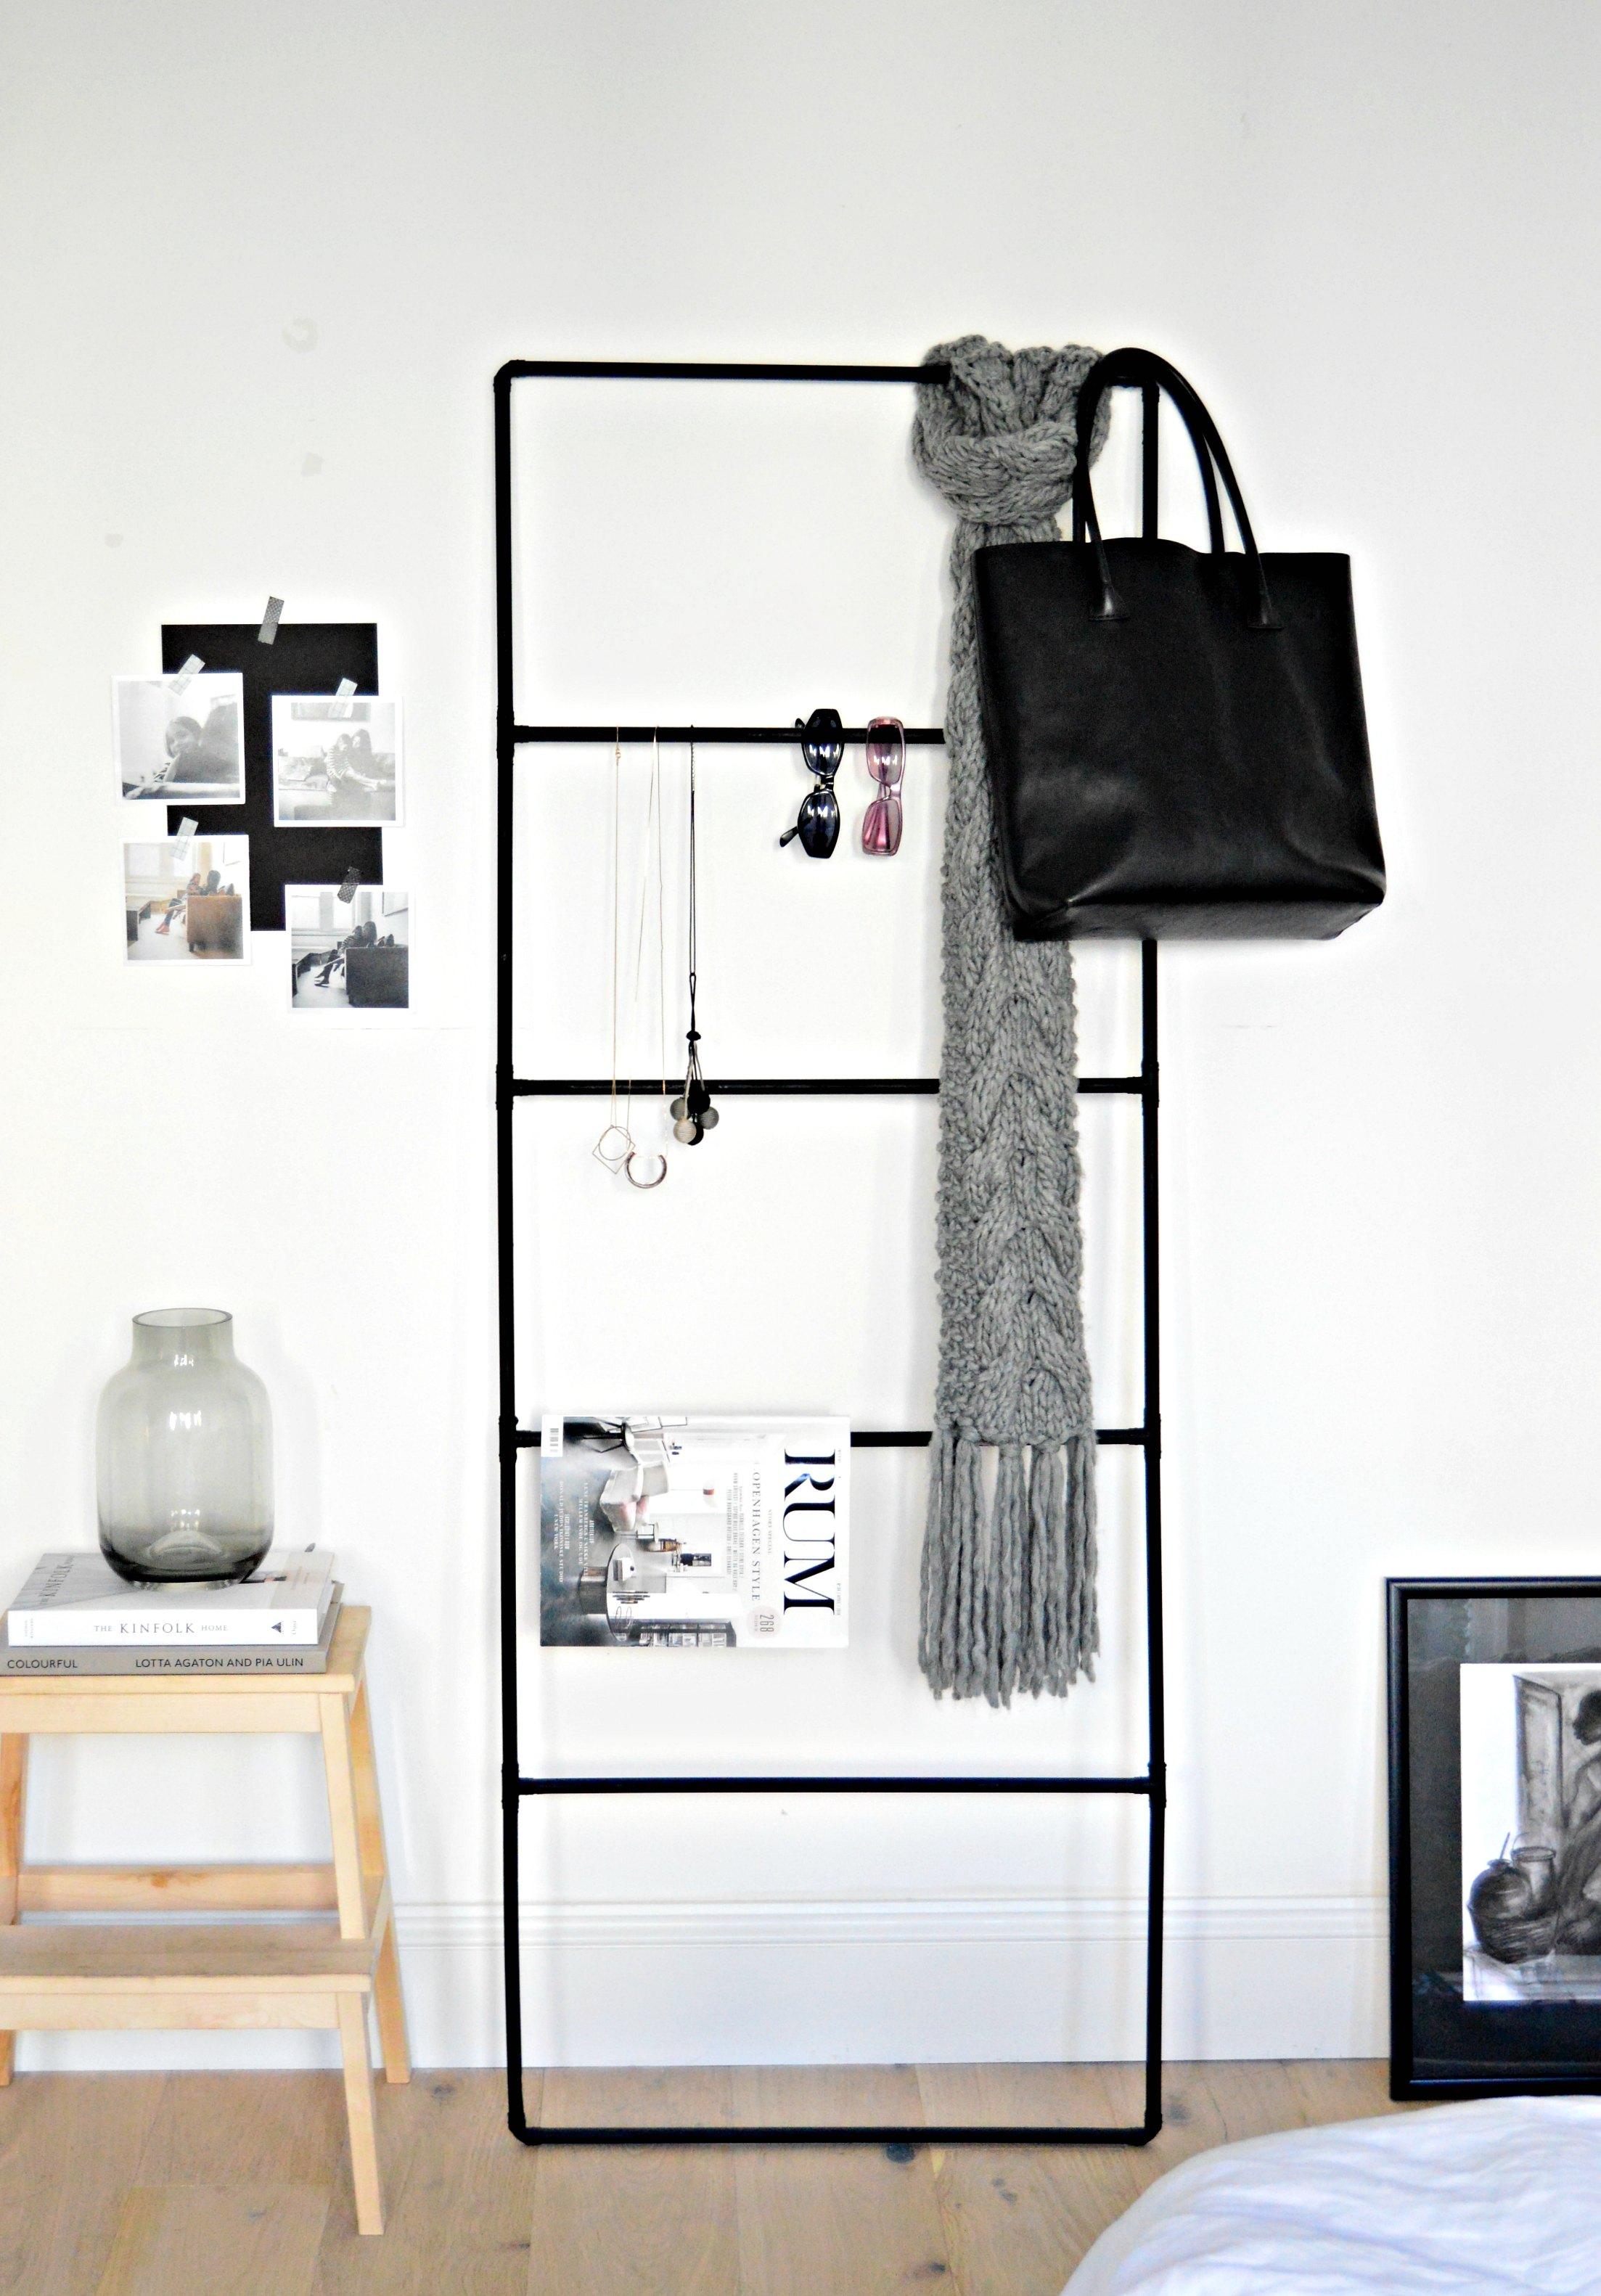 Organised Bedroom 7 Diys Guaranteed To Get You More Organised At Home Diy Home